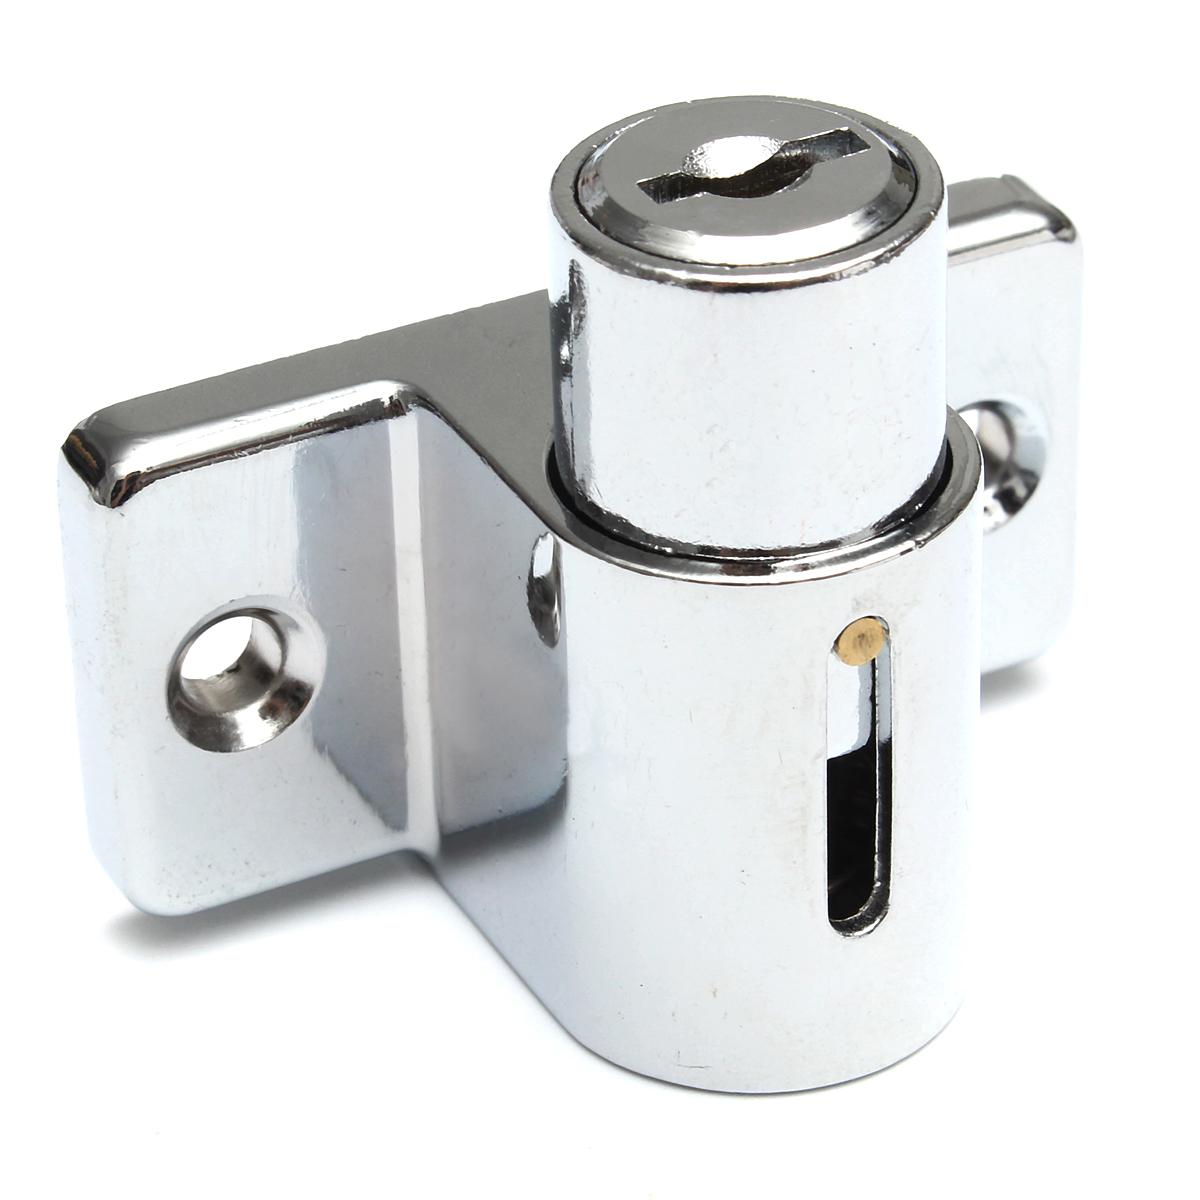 Sliding Door Safety Lock : Aluminum sliding patio door window bolt locking security